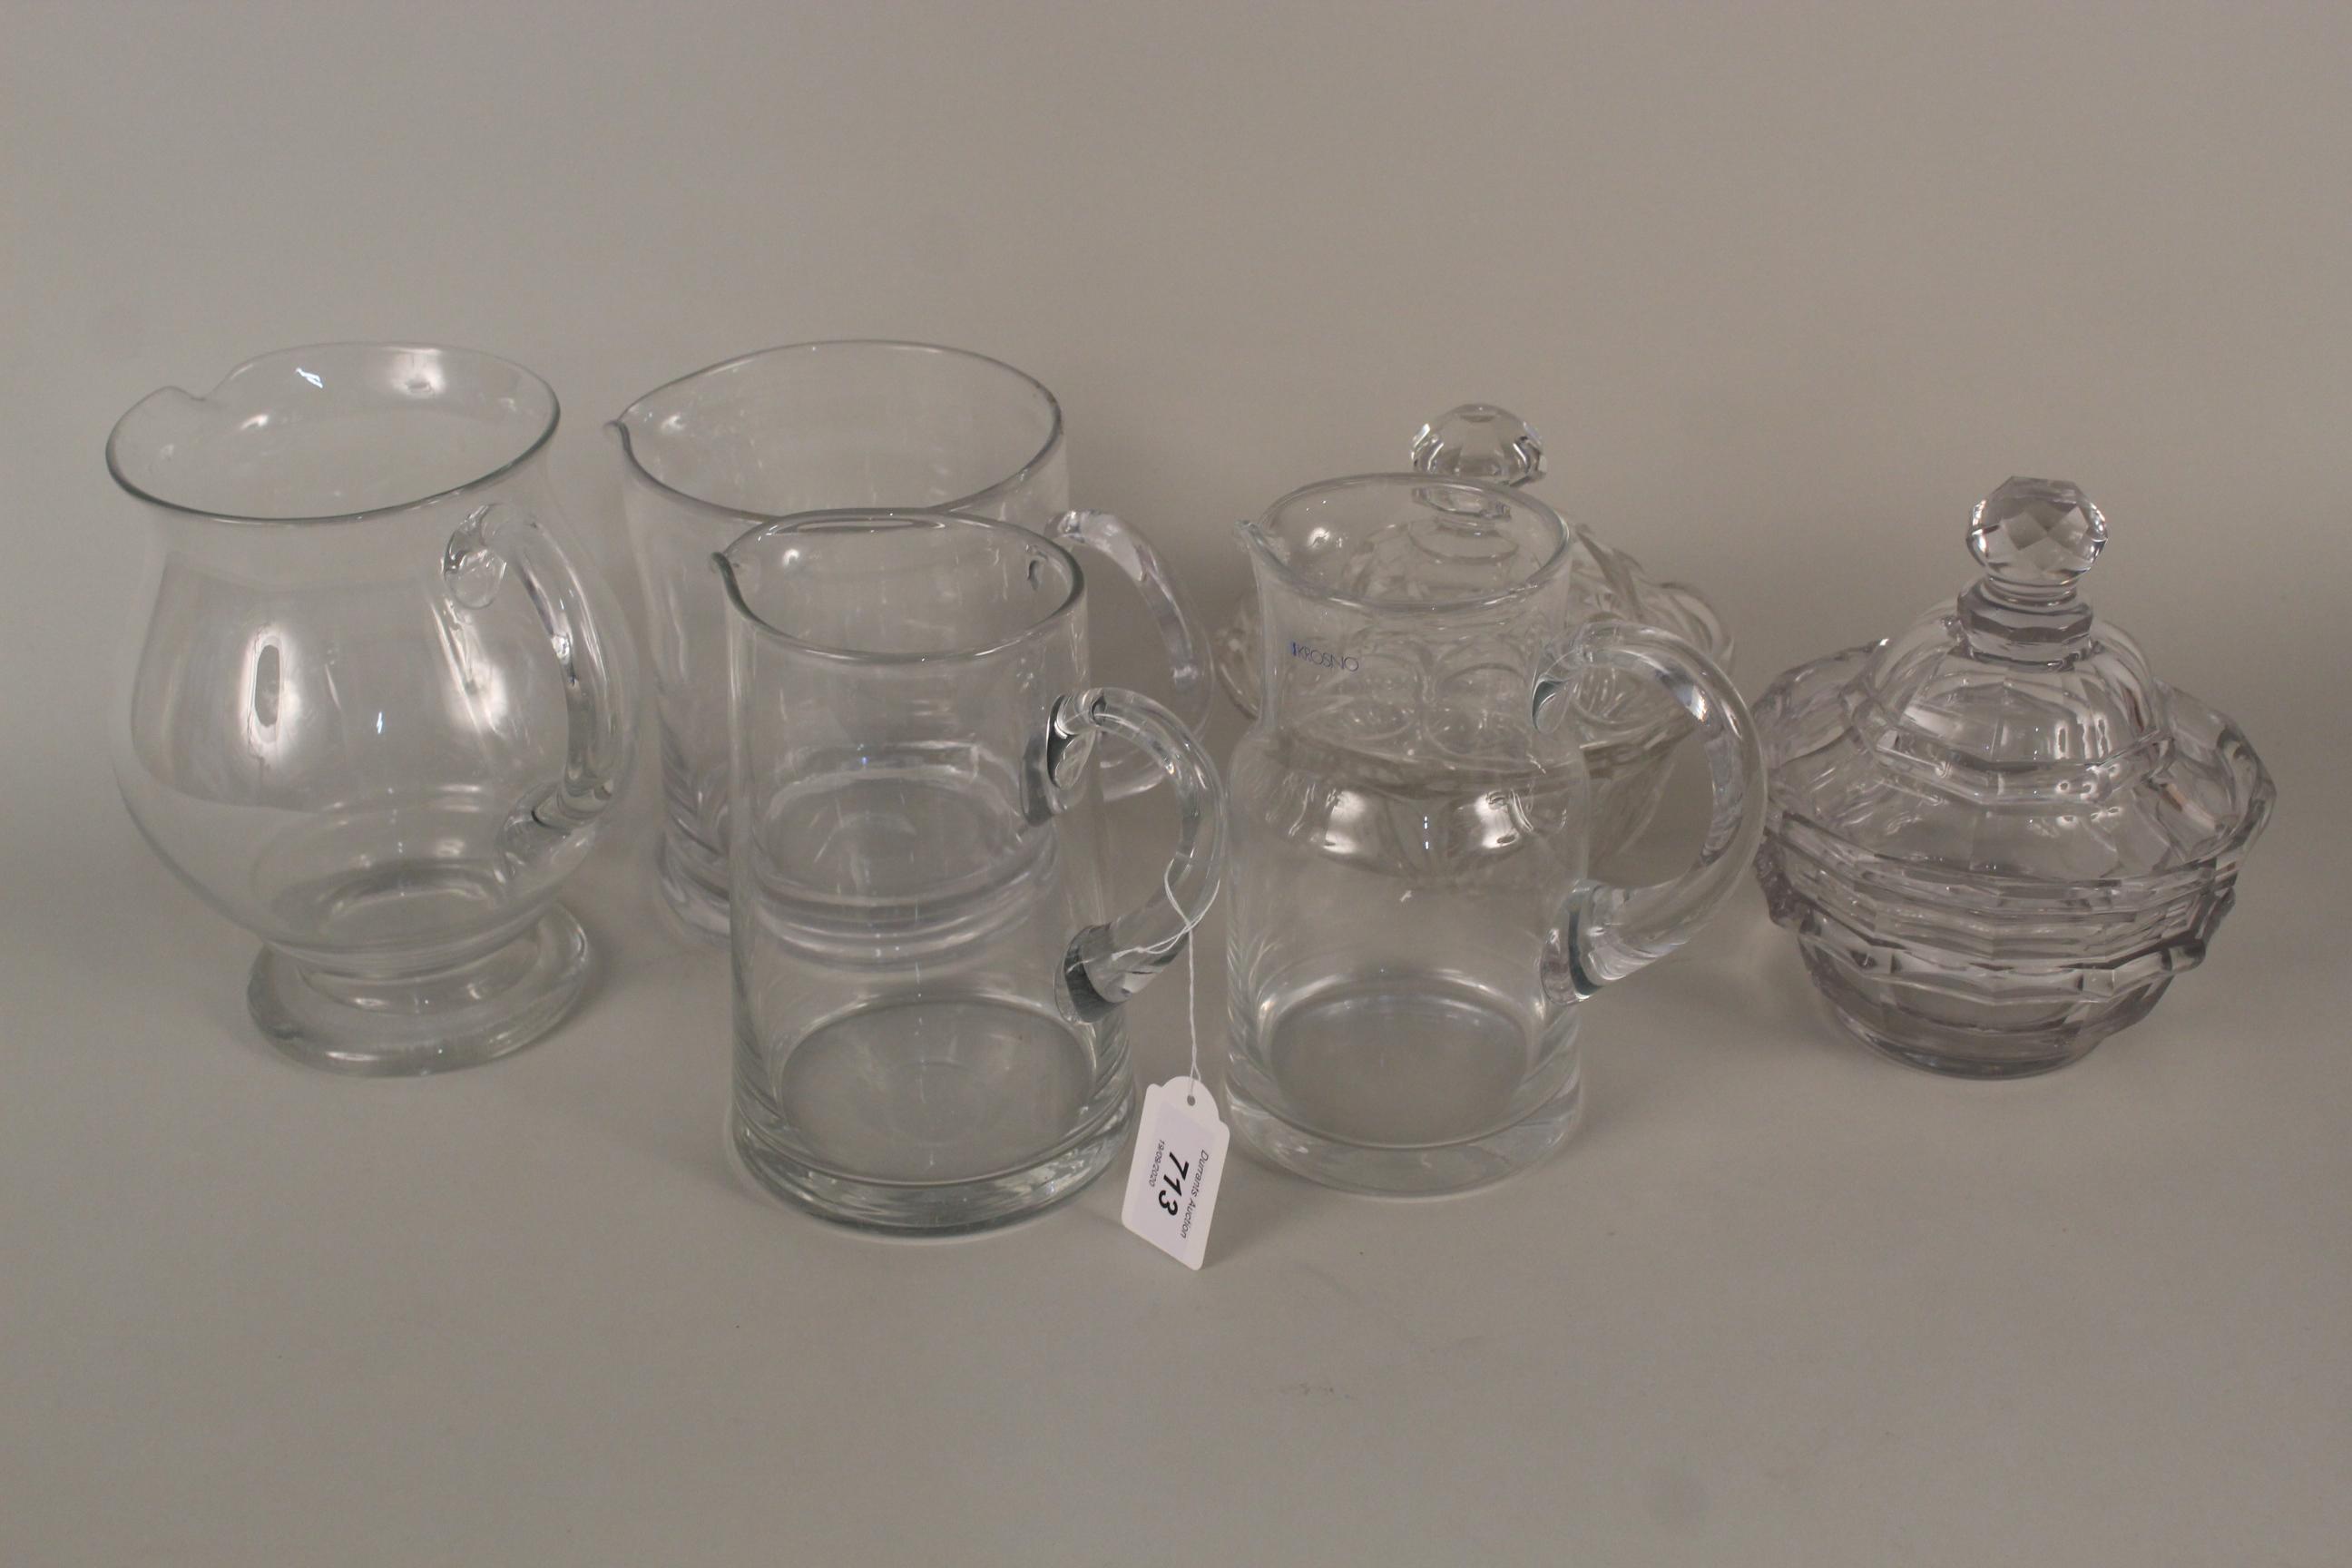 Lot 713 - Six cut glass items, two Victorian hand cut jugs,